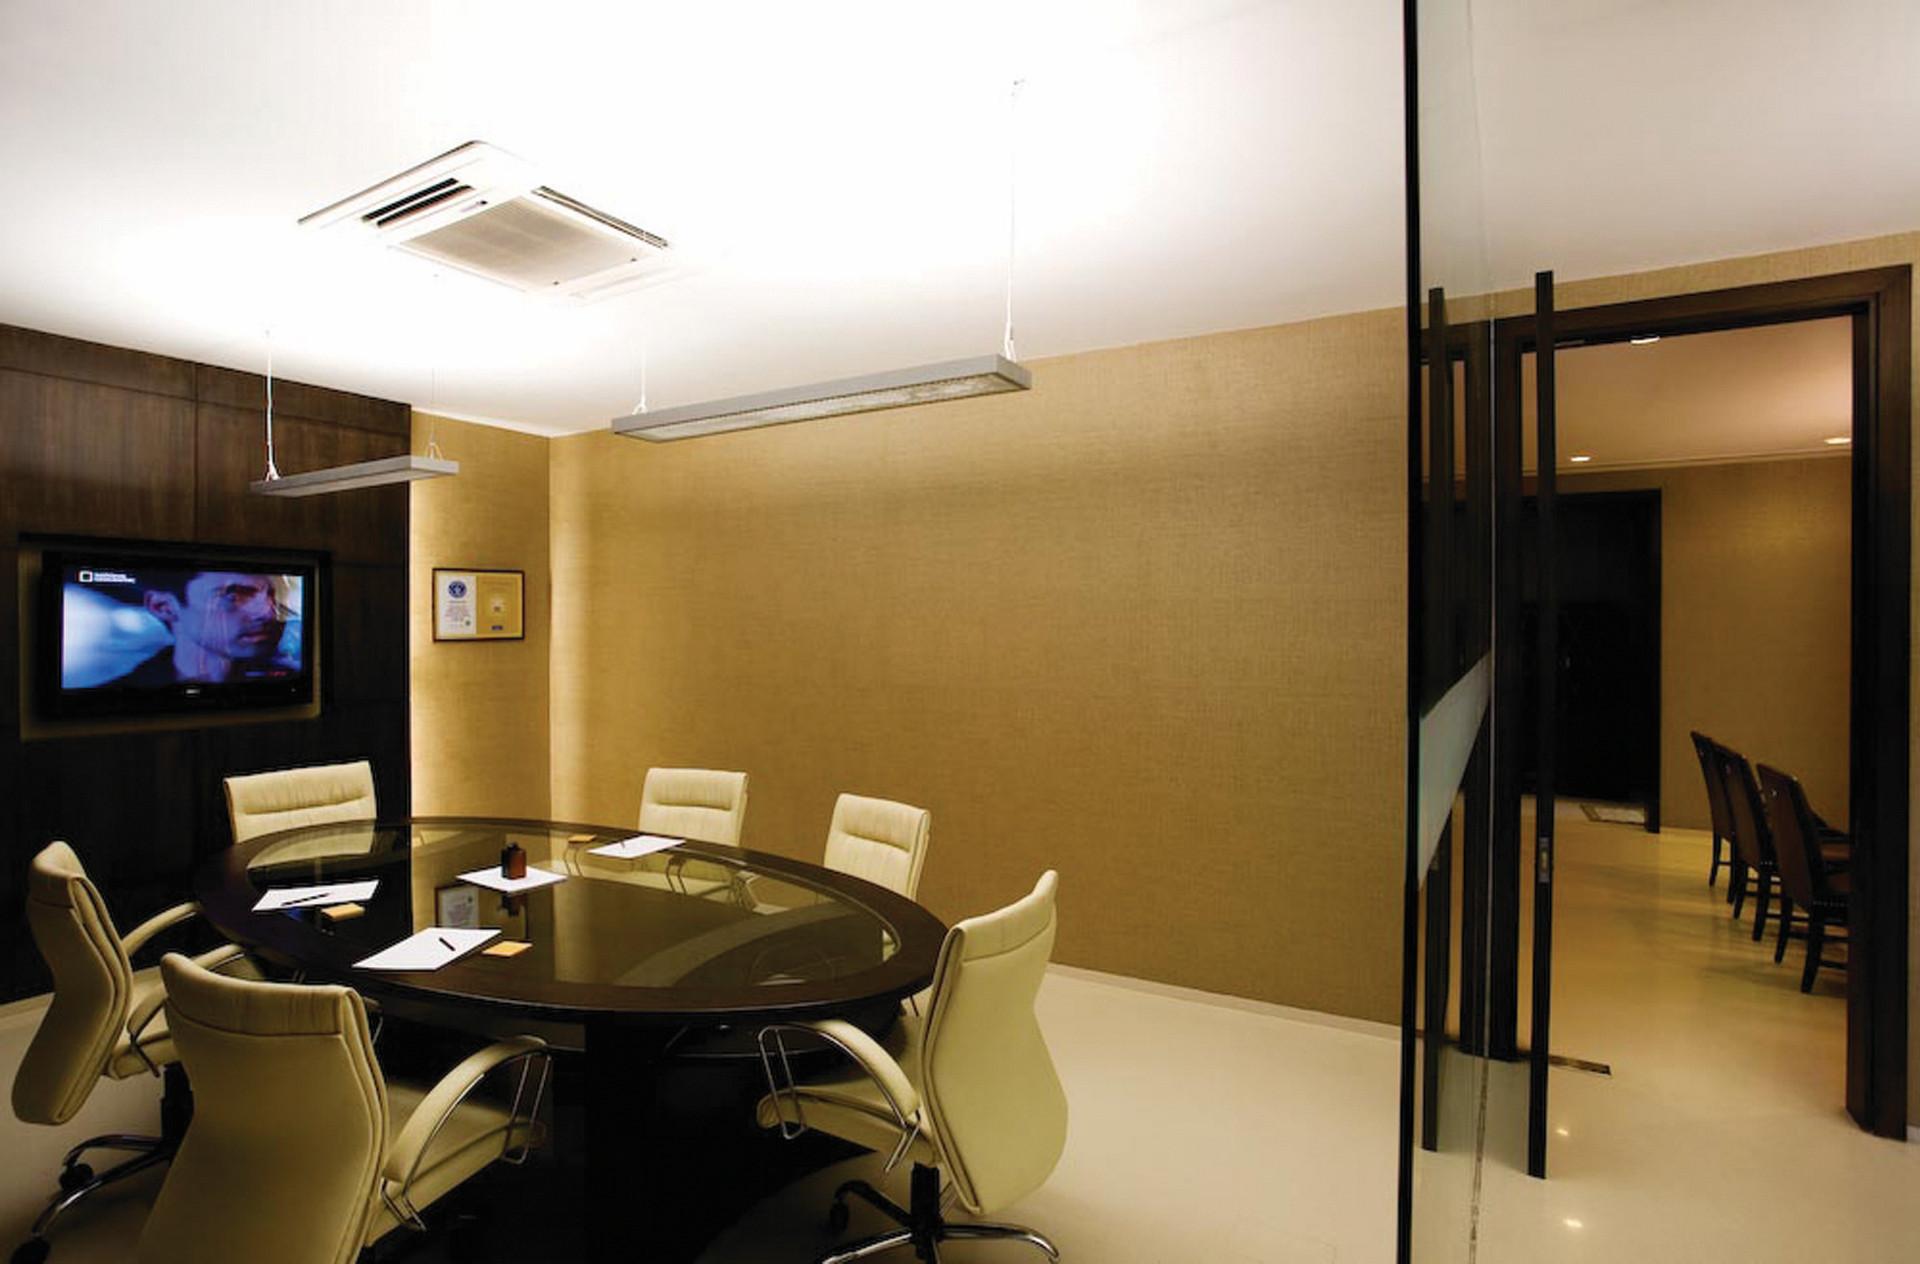 Office for Crayons / IAAD